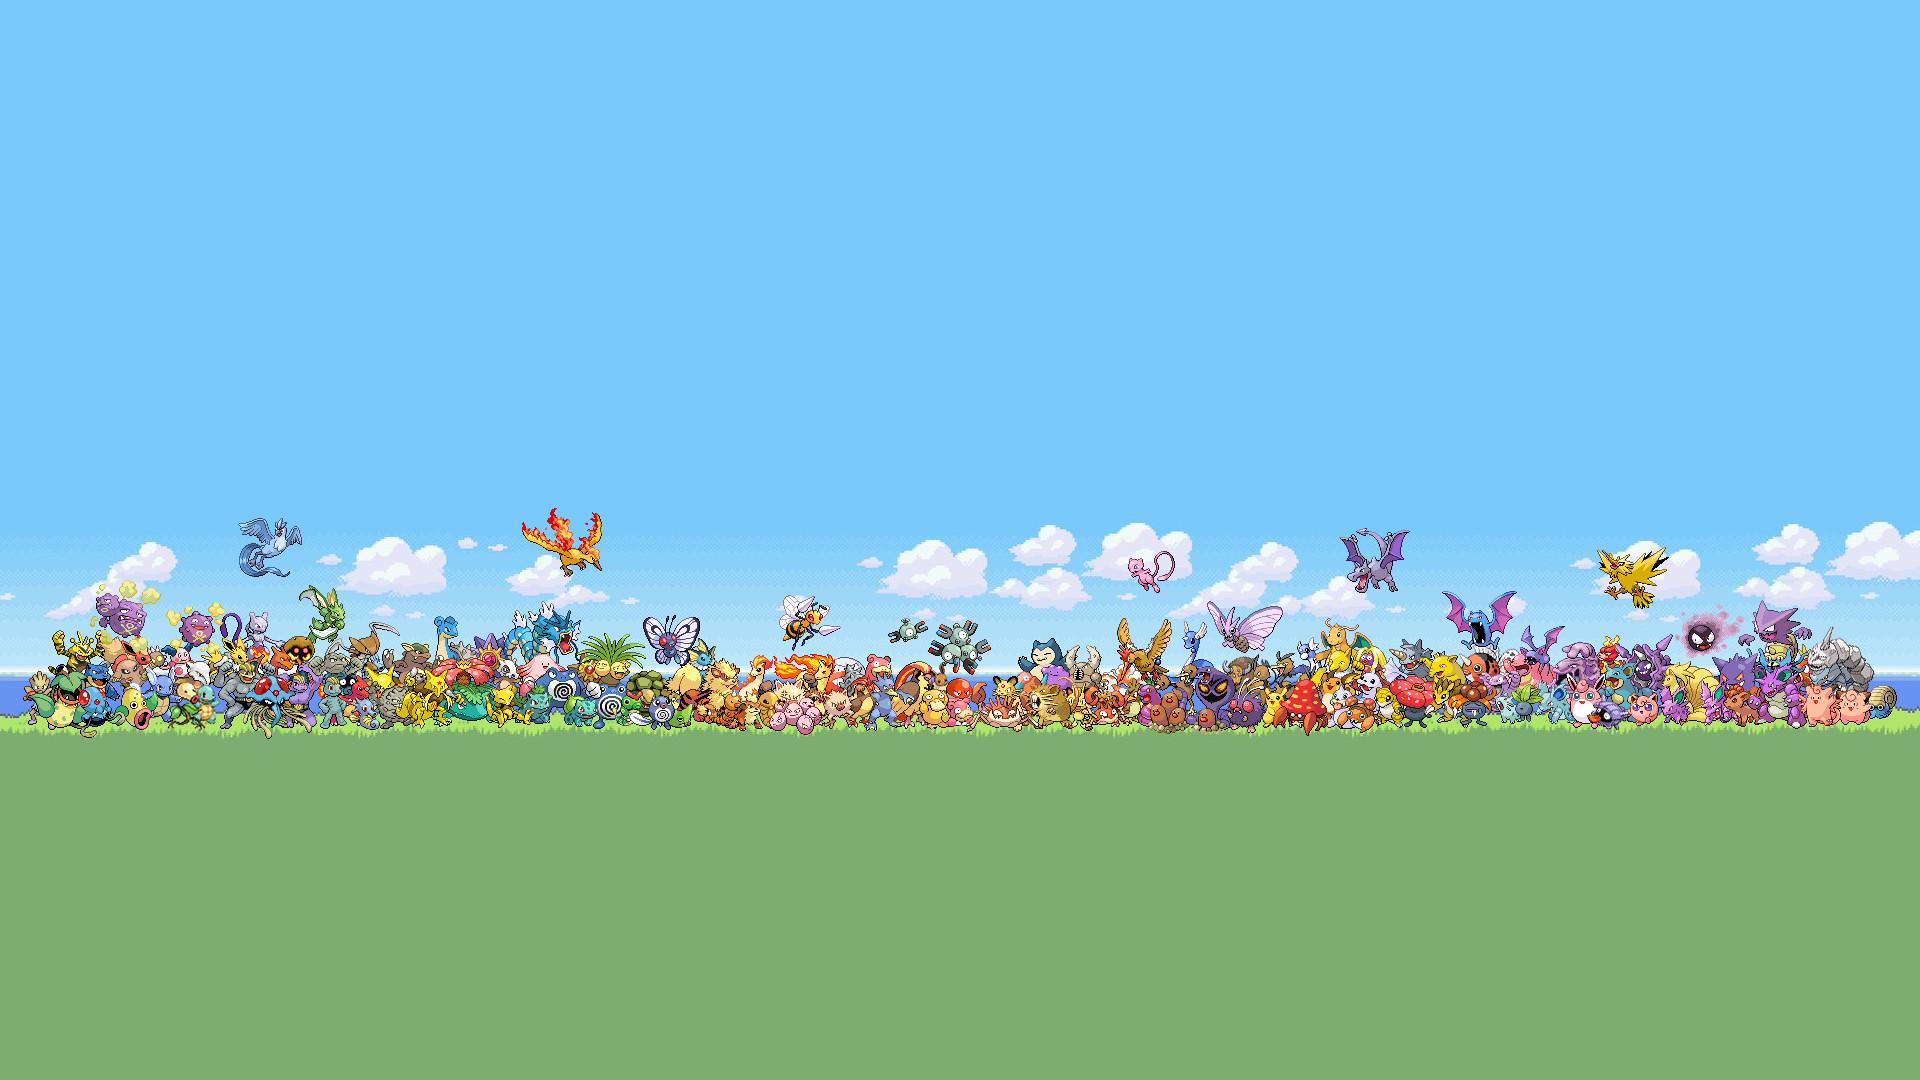 legendary HD Collections – BozhuWallpaper – All Pokemon Wallpapers Images.  All Pokemon Wallpaper Background. All Pokemon Wallpaper Desktop Background.